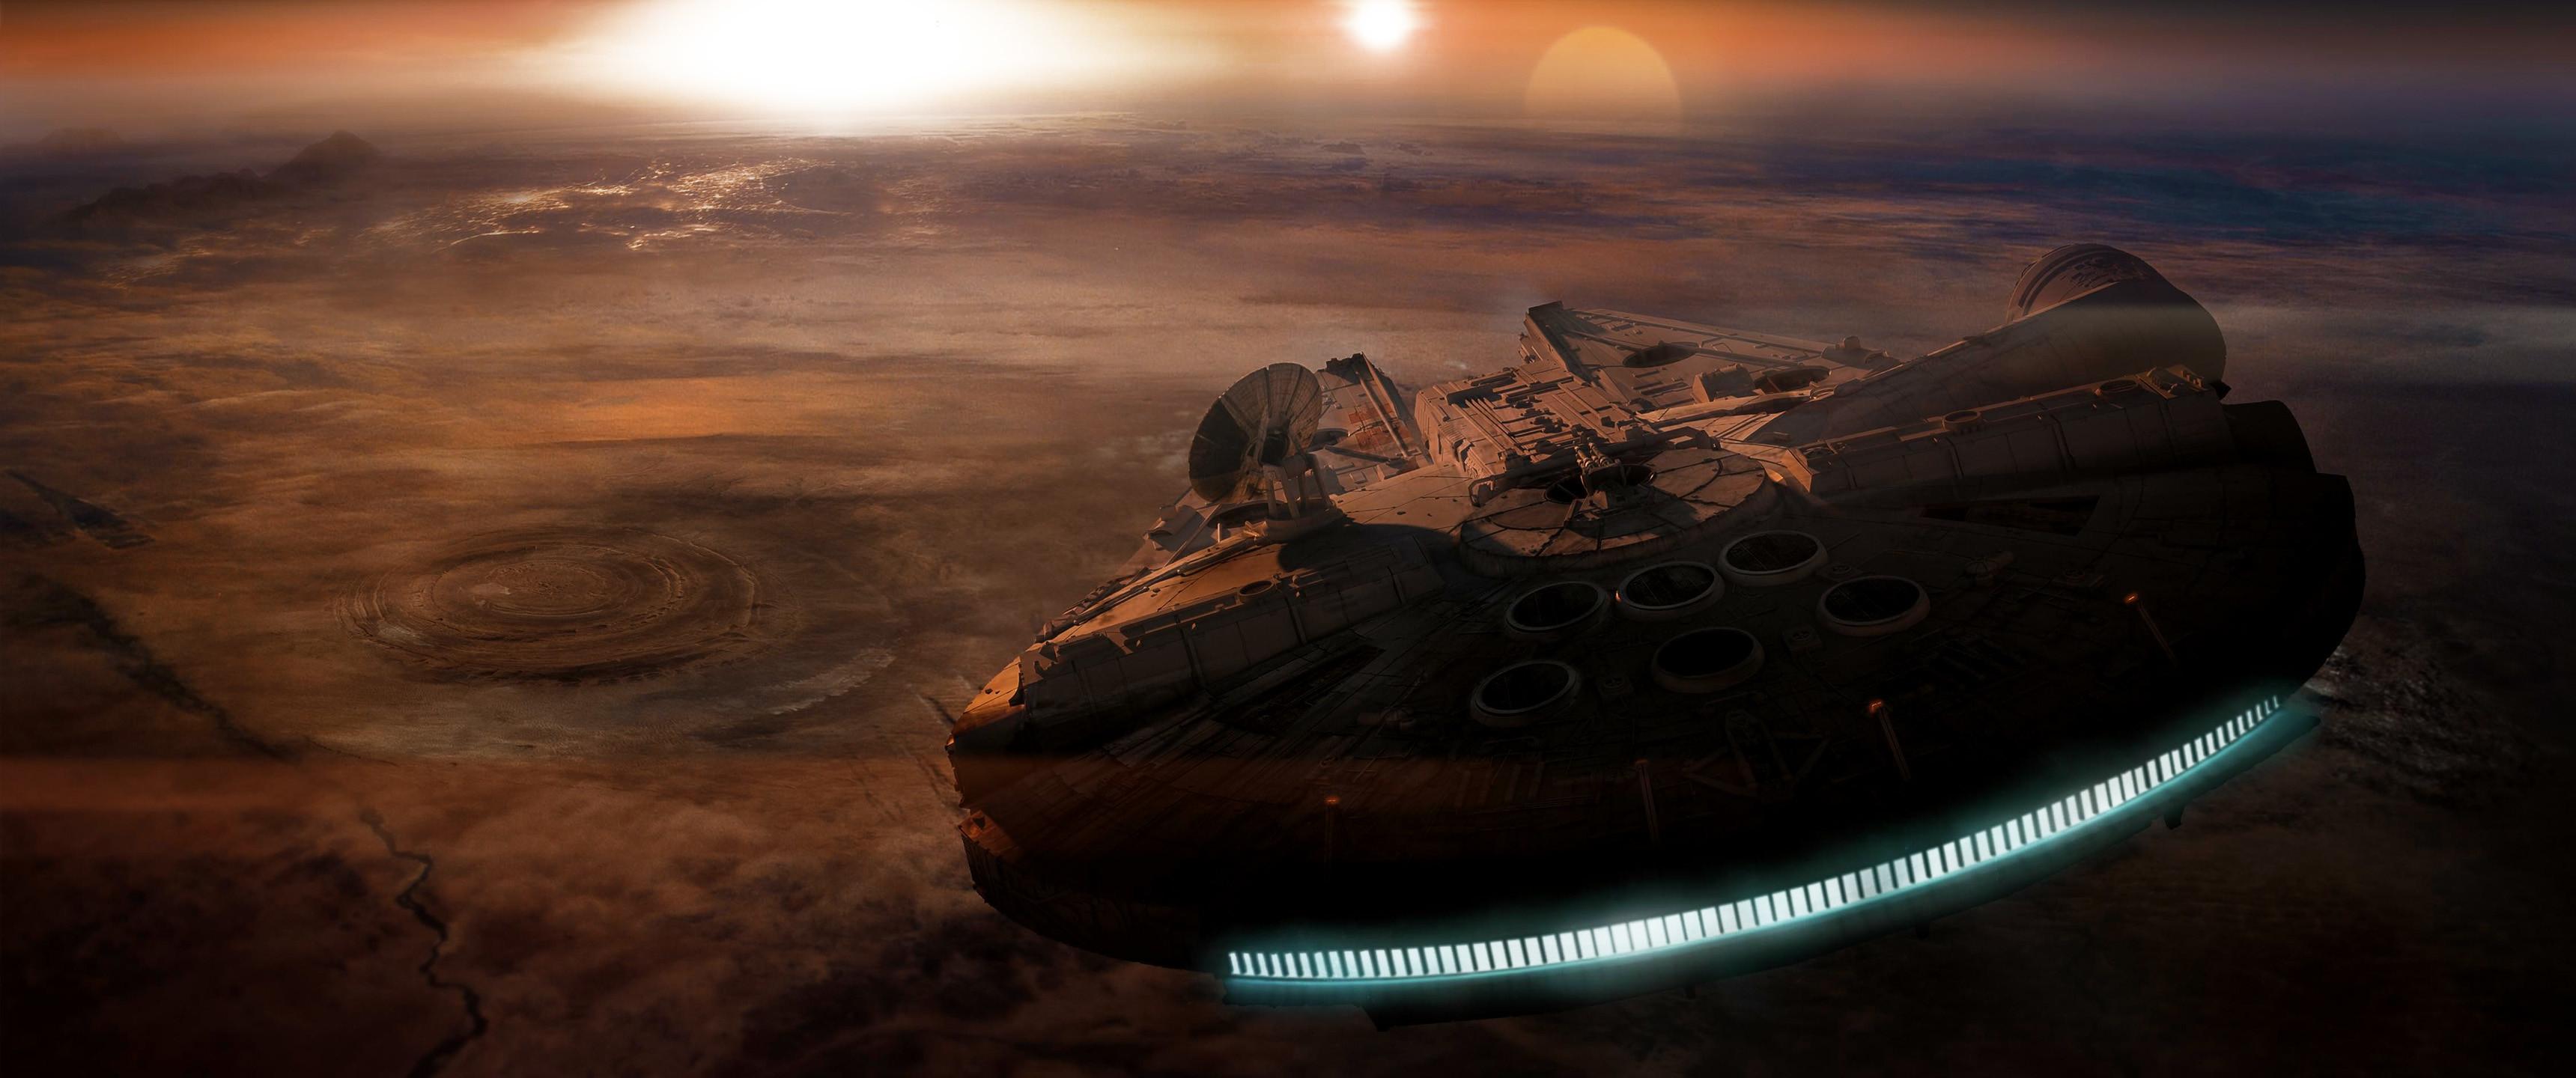 Star Wars ultra widescreen backgrounds